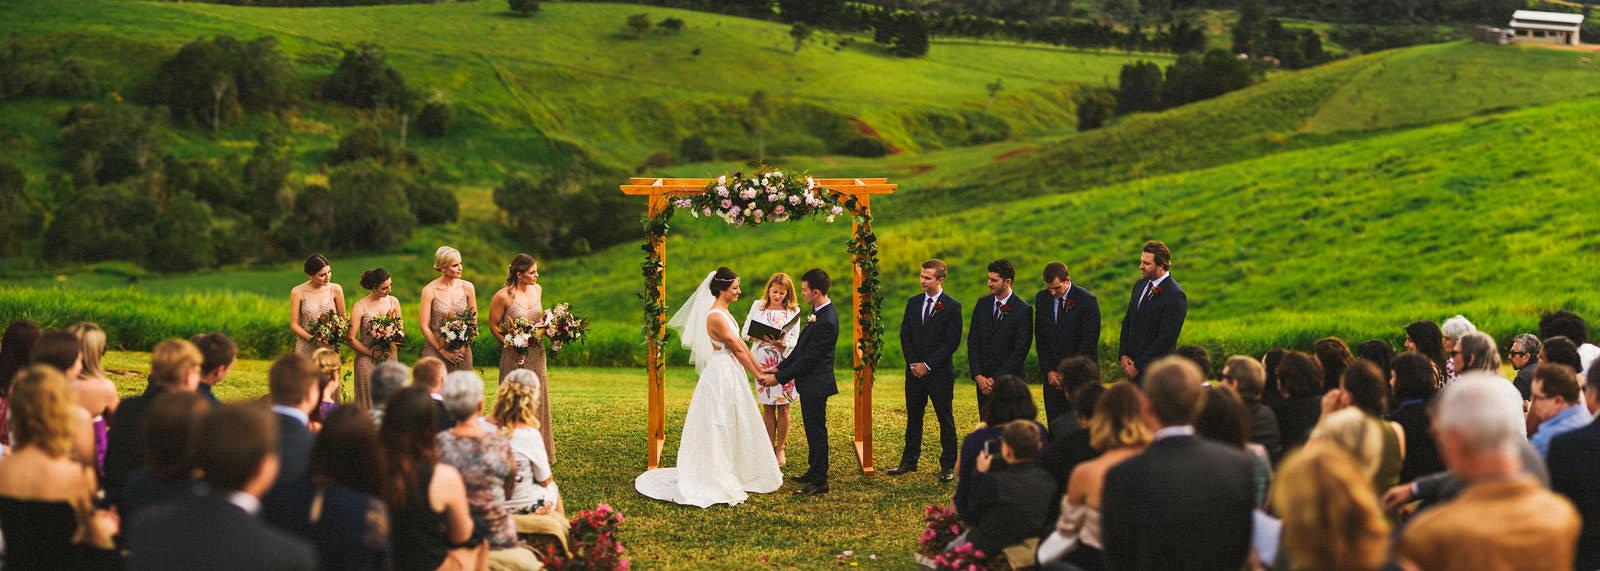 tablelands_wedding_0020